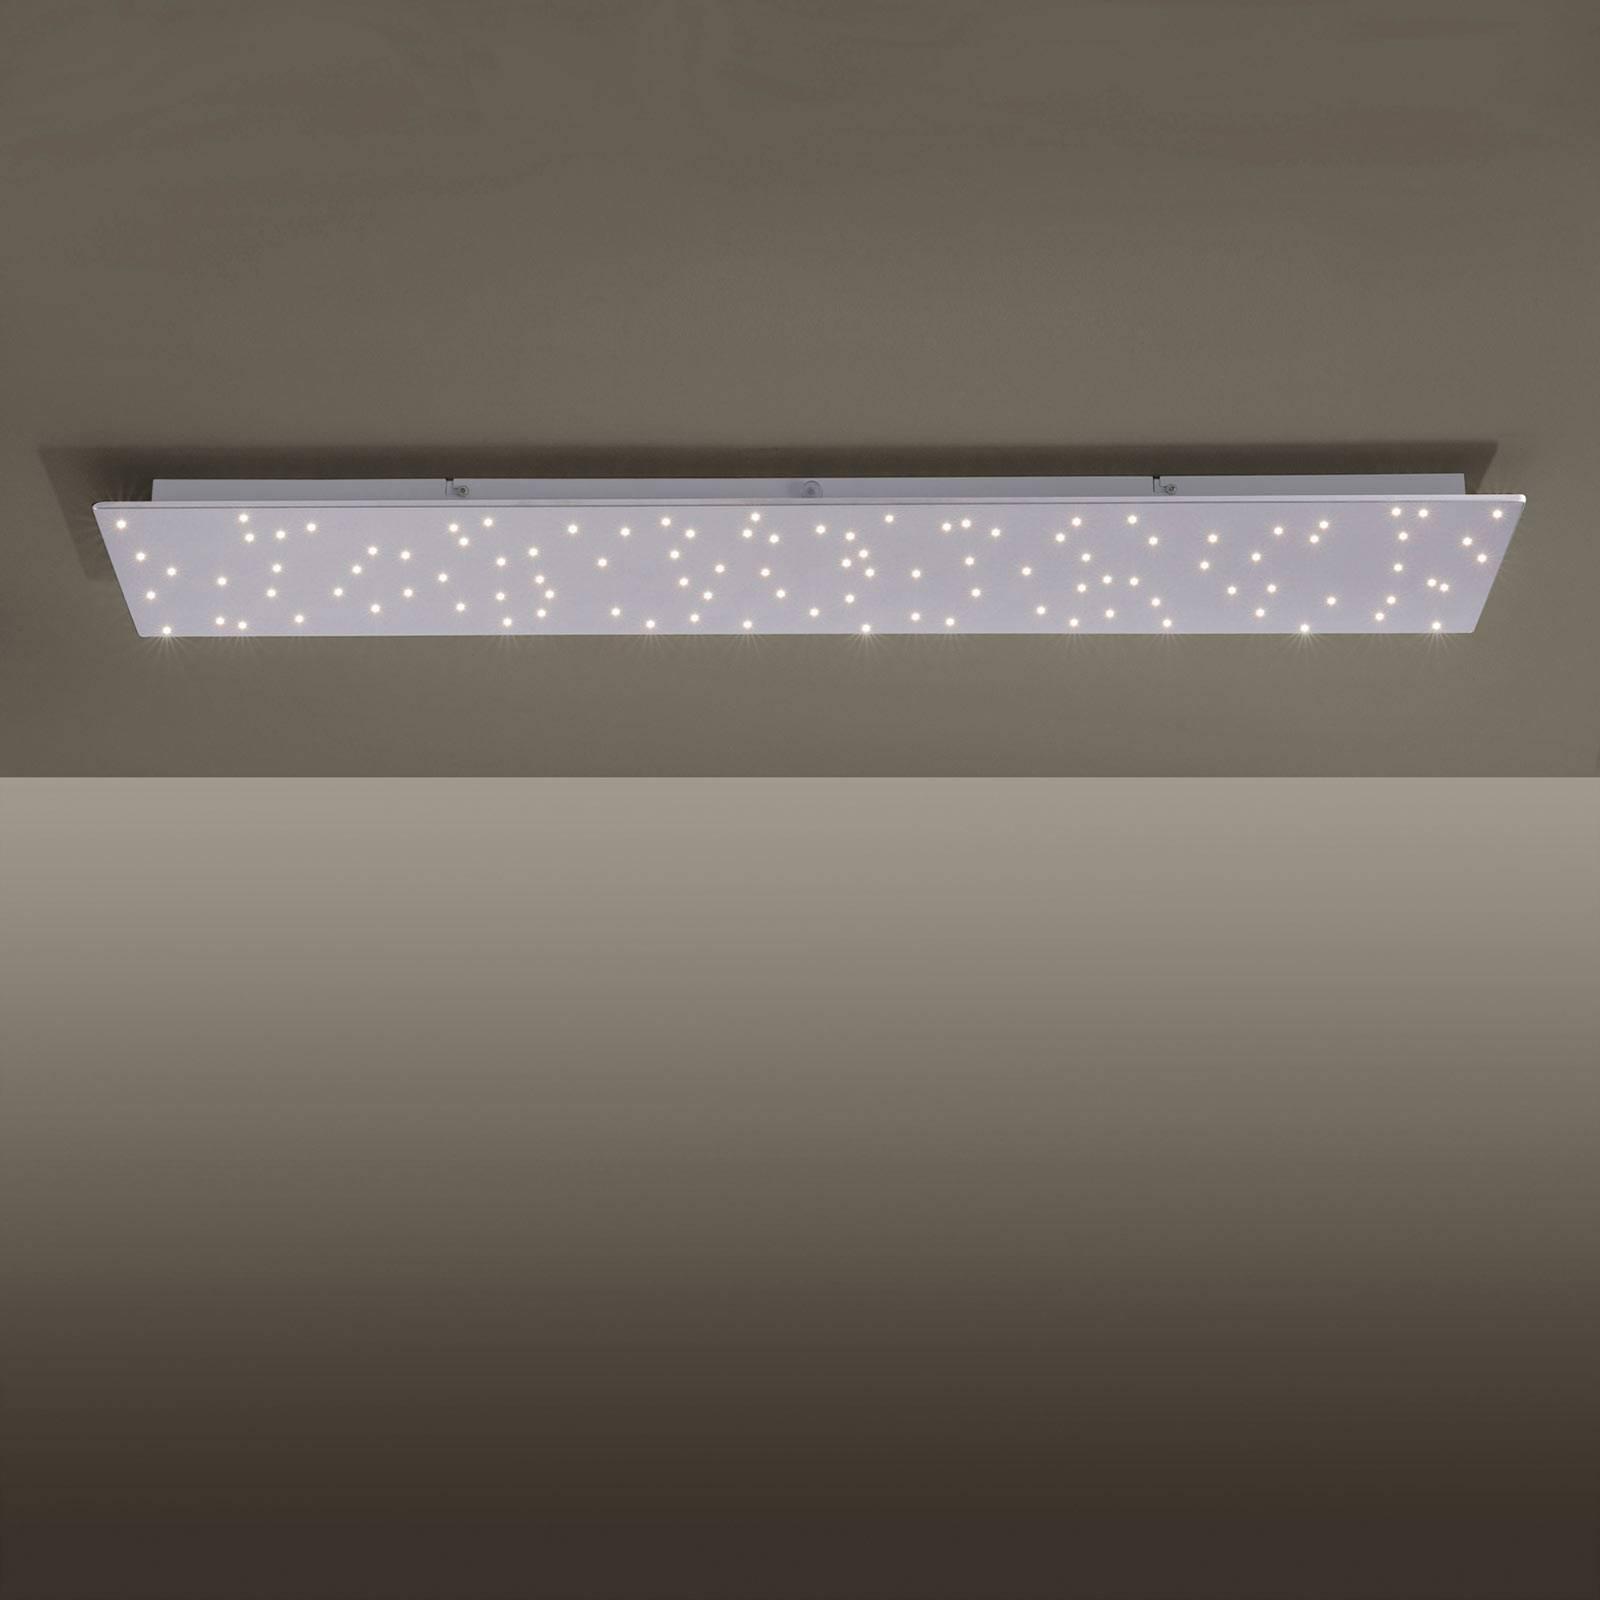 Lampa sufitowa LED Sparkle, tunable white 100x25cm